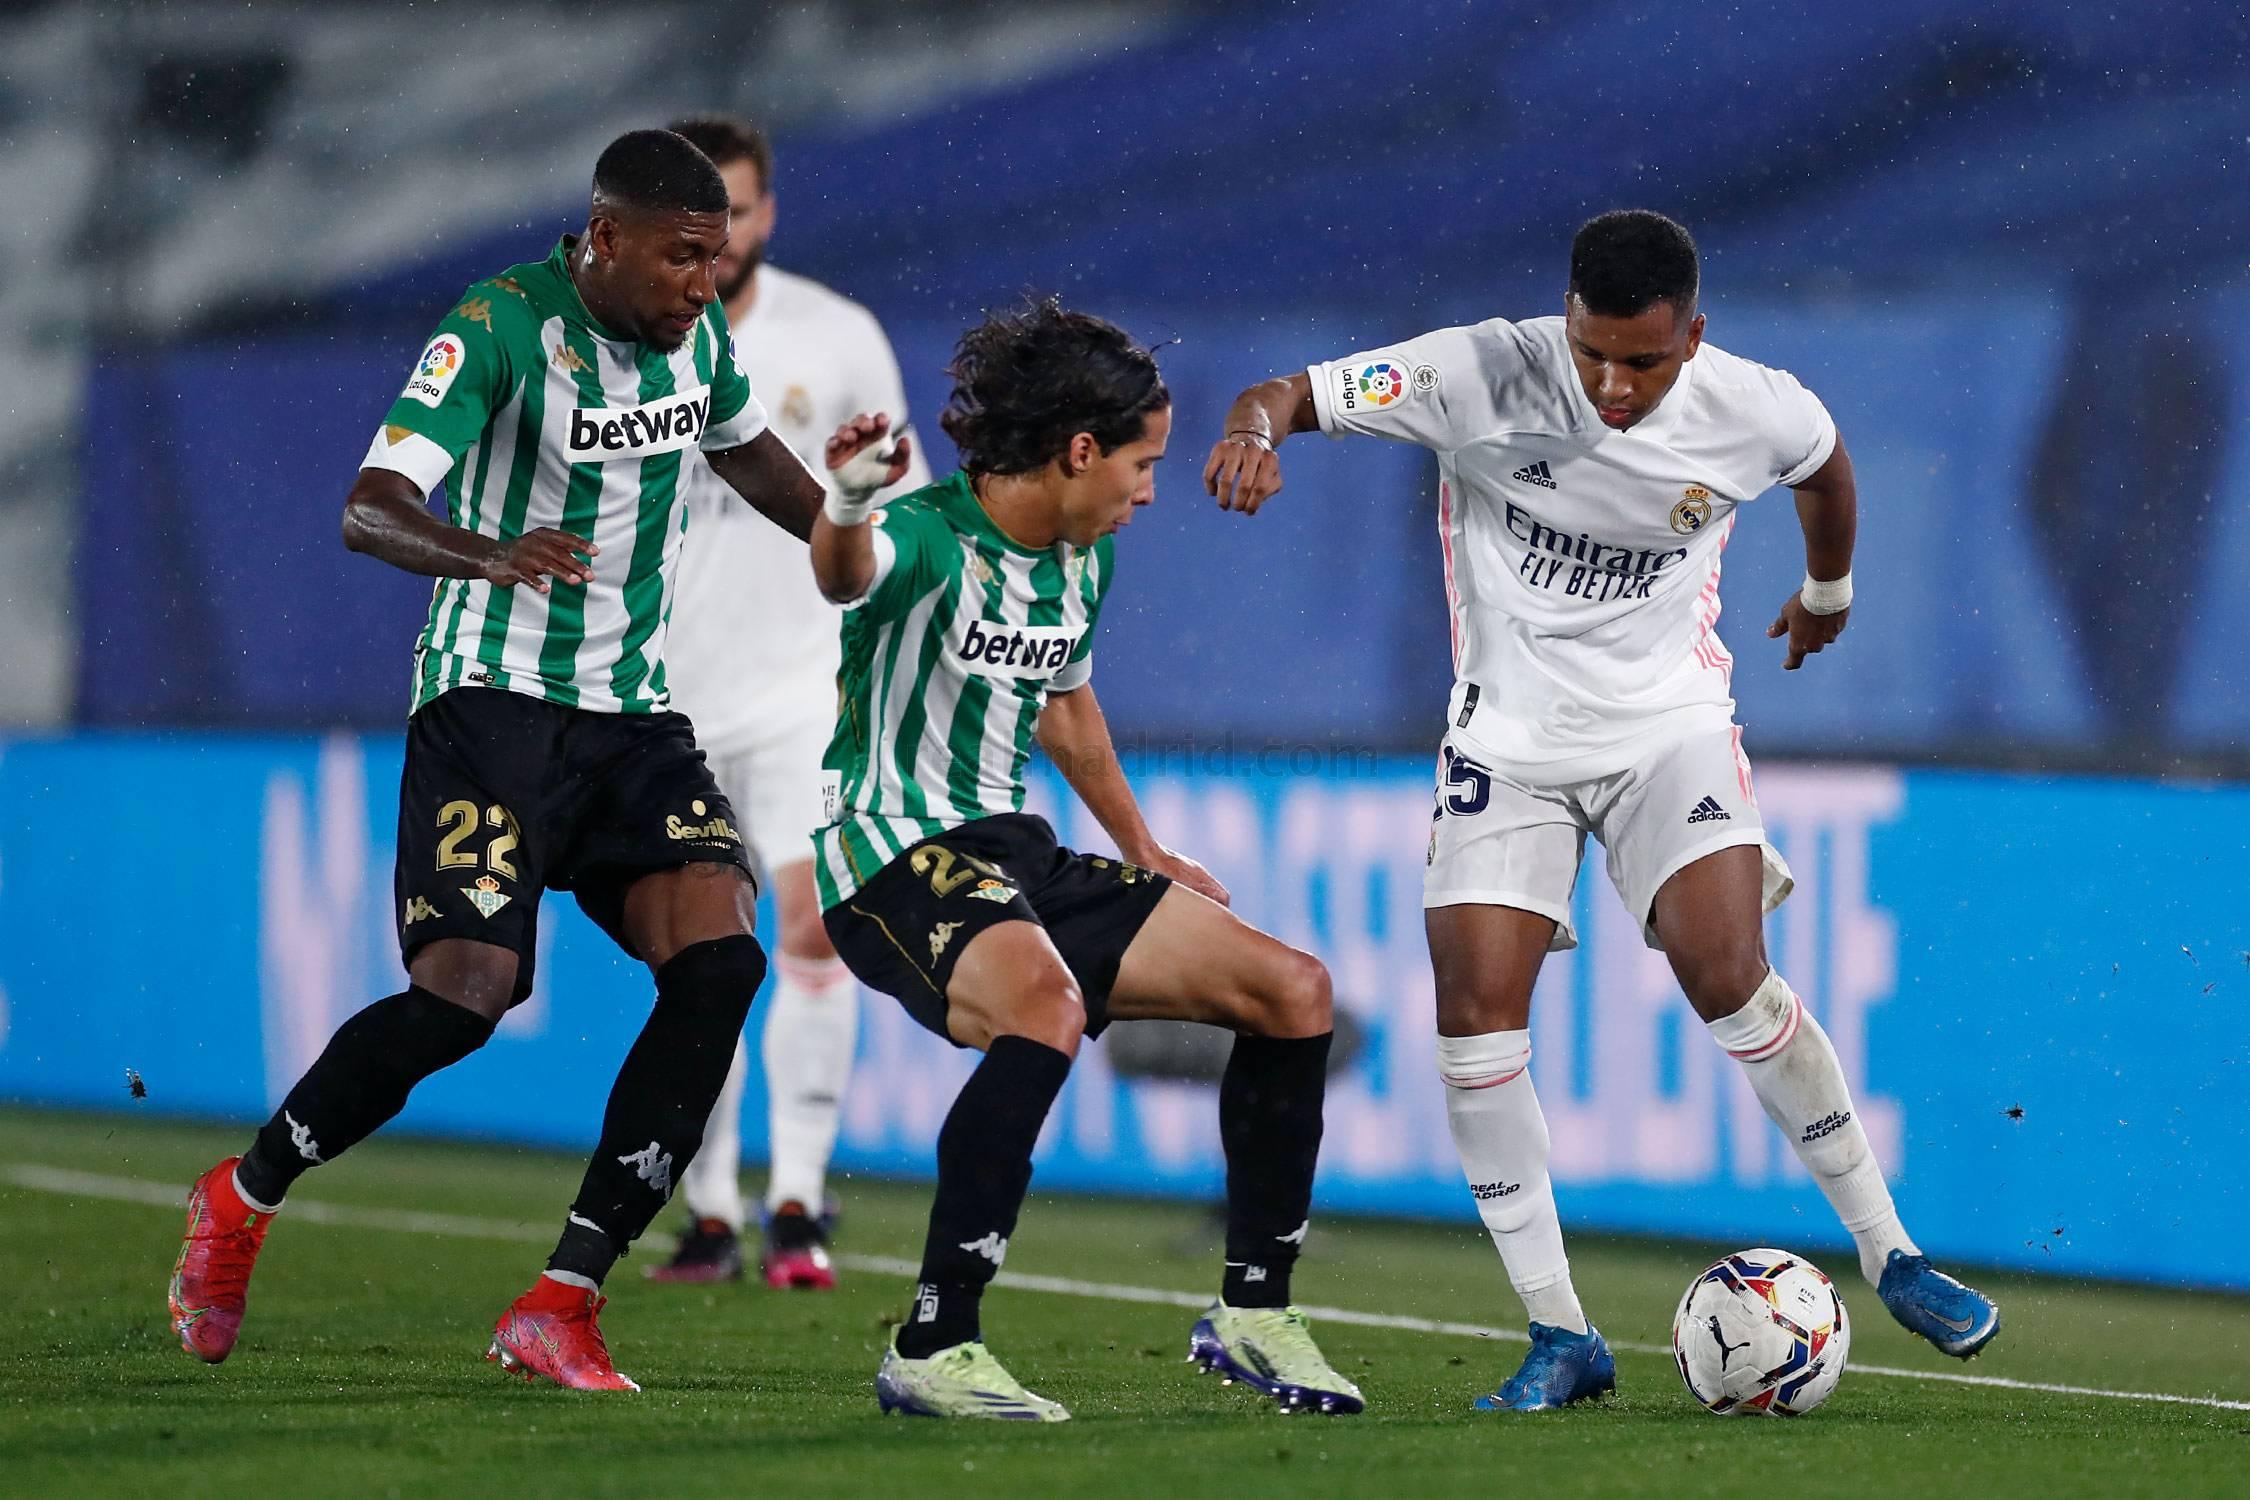 Real Madrid - Betis - 15-05-2021